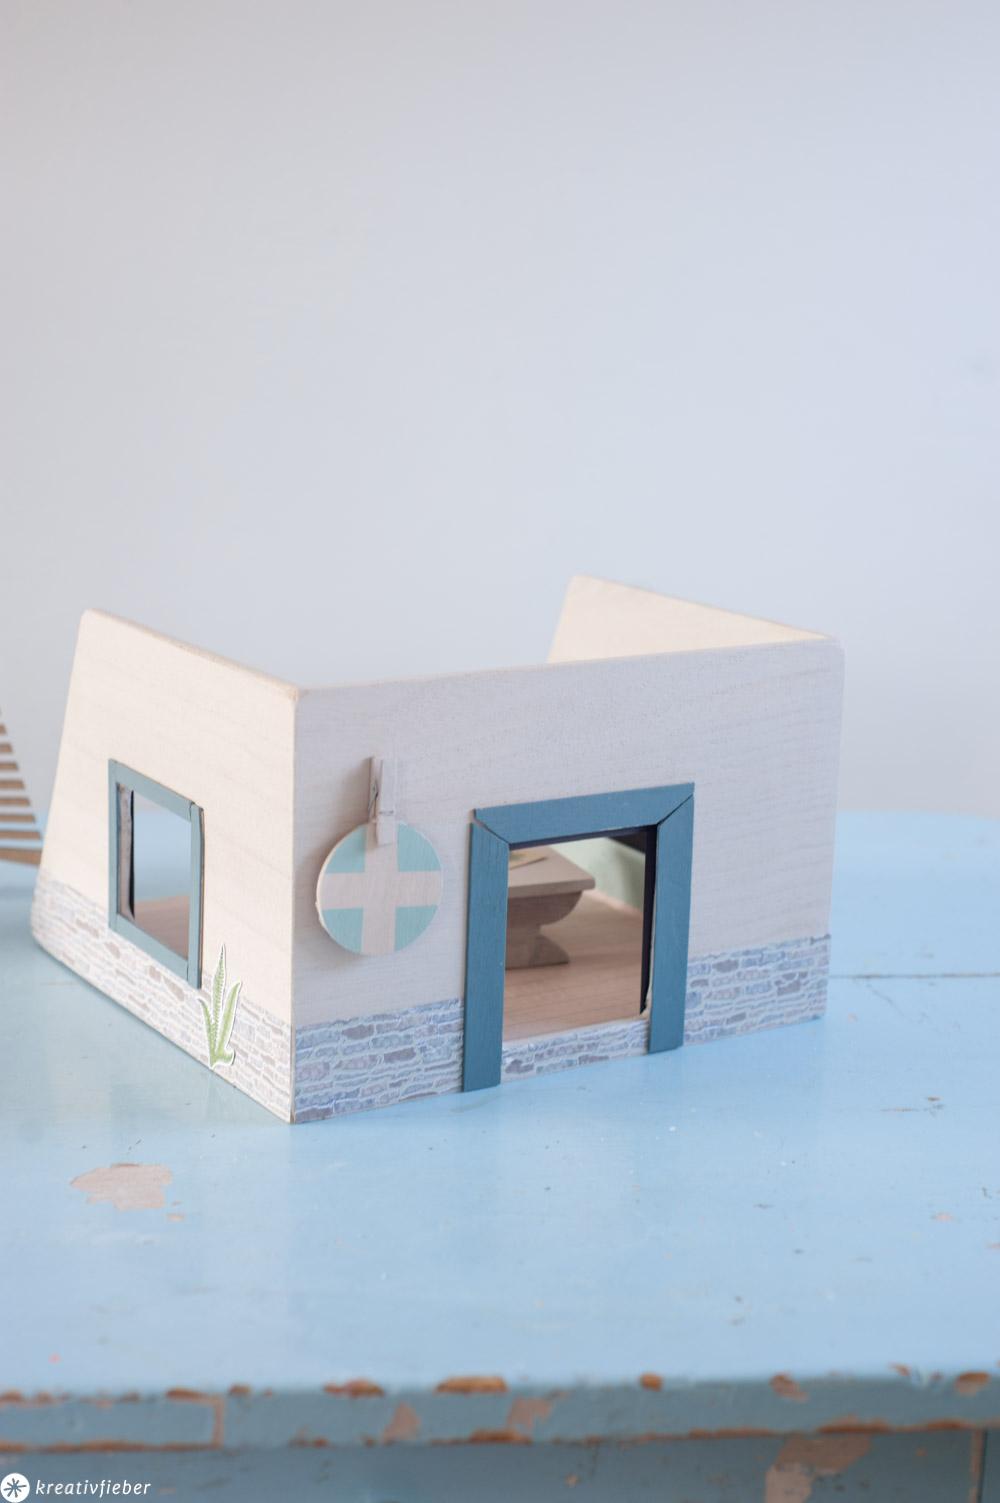 Upcyclingidee Holzkiste in Puppenhaus verwandeln